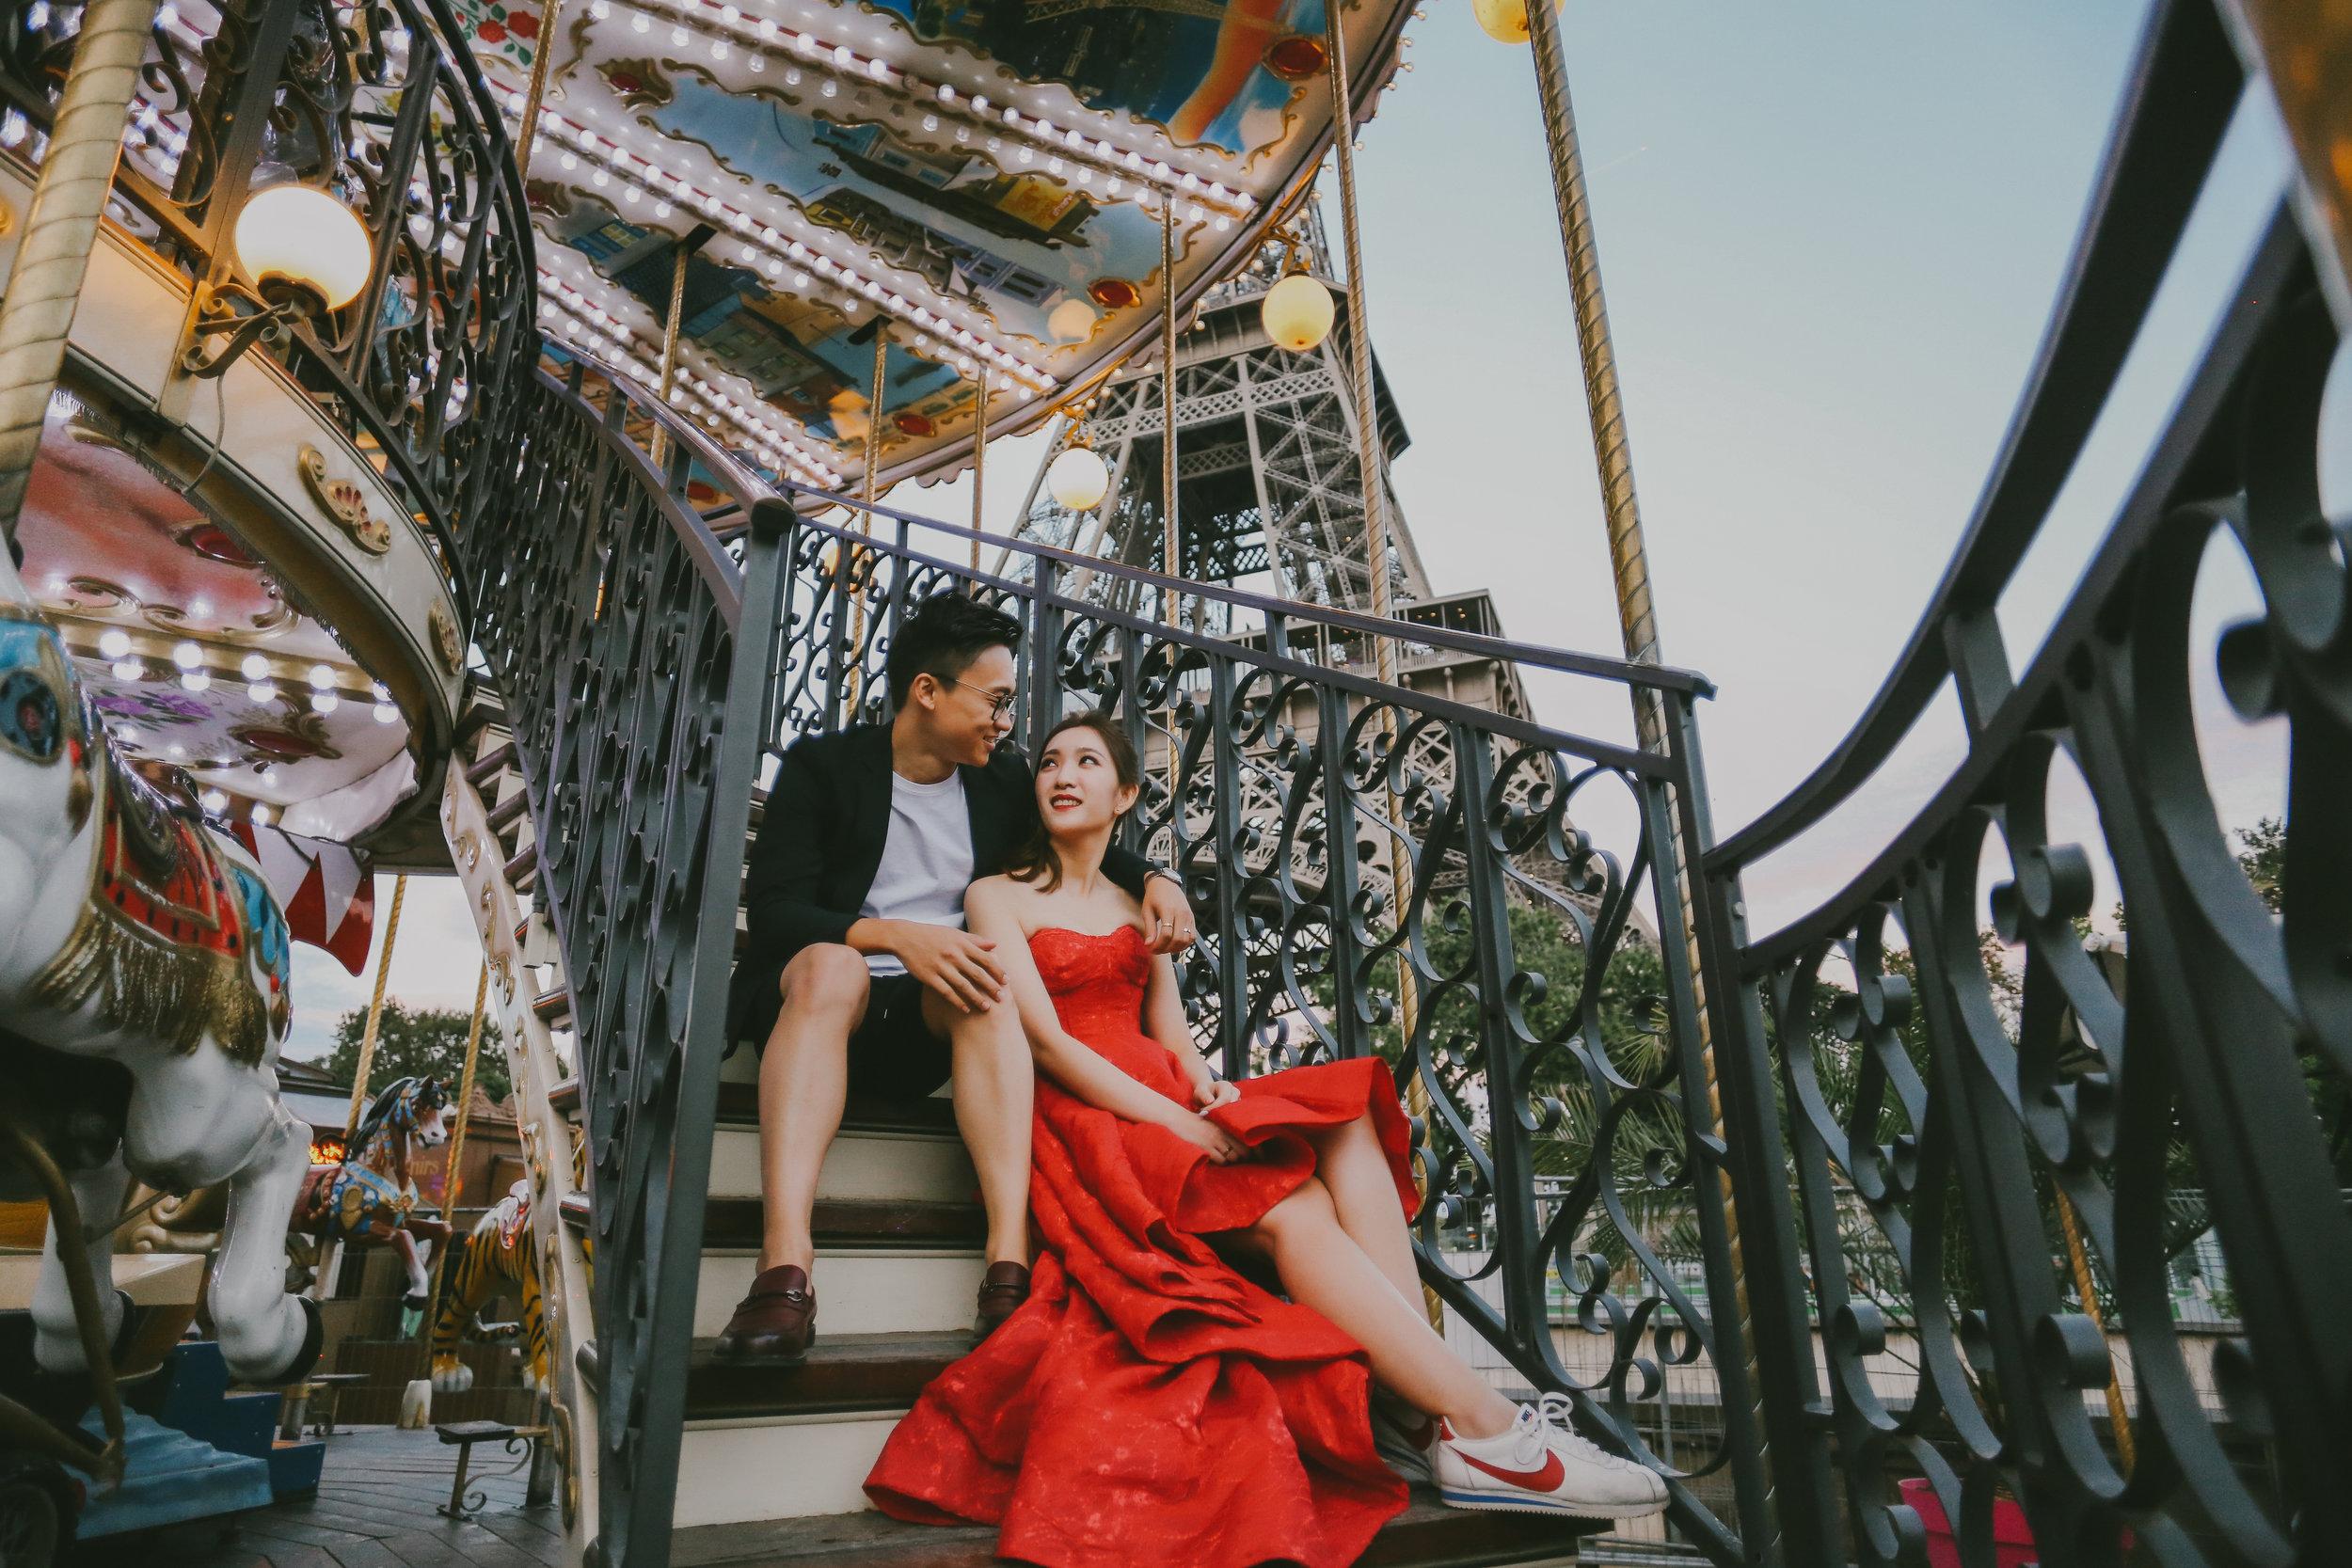 2018-pre-wedding-studio-numb9r-paris-high-2053e.jpg